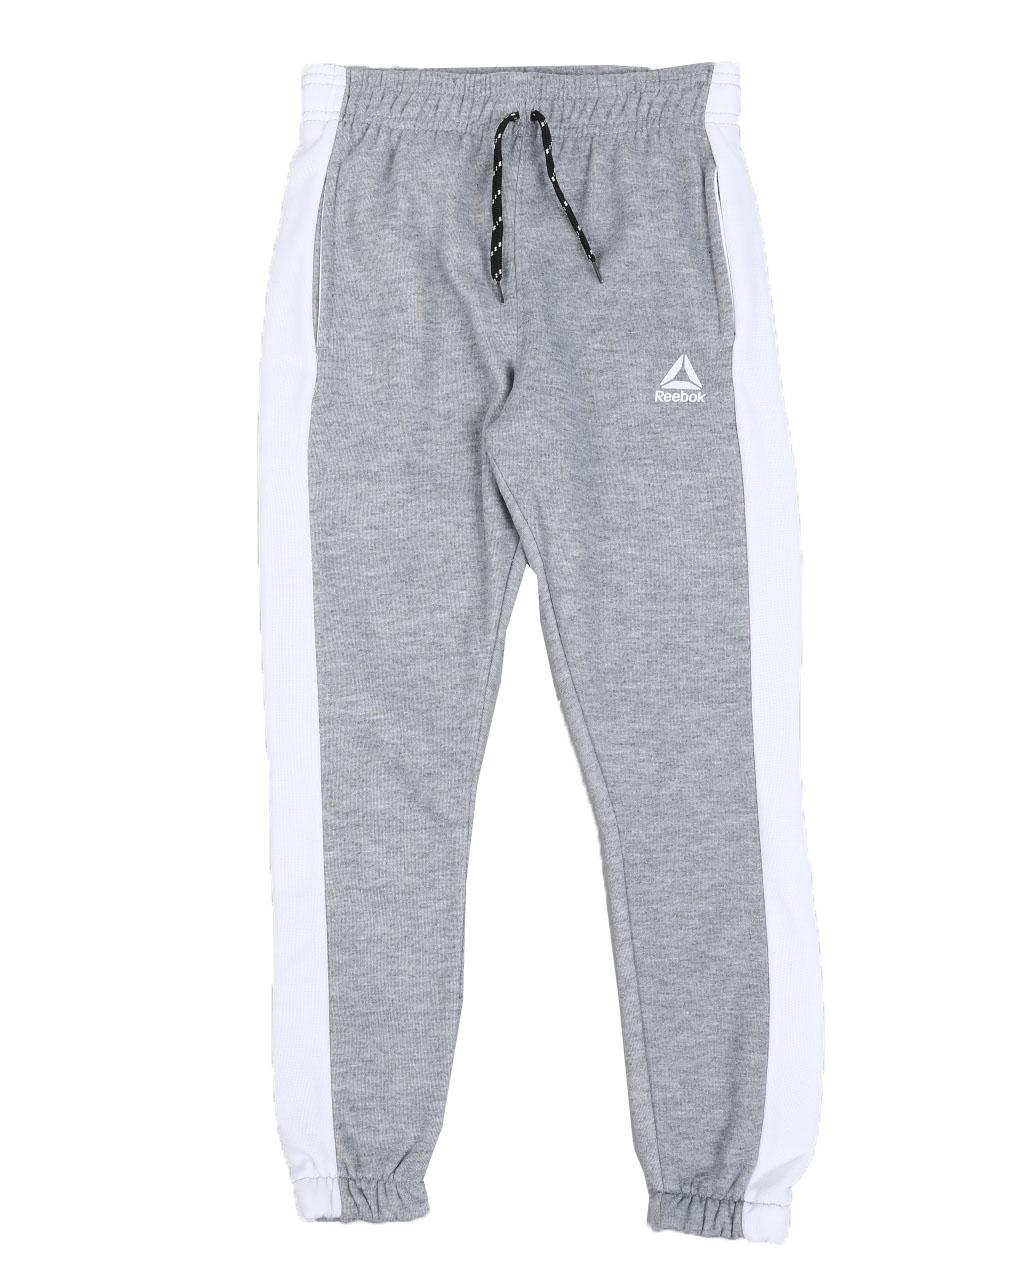 reebok fleece joggers